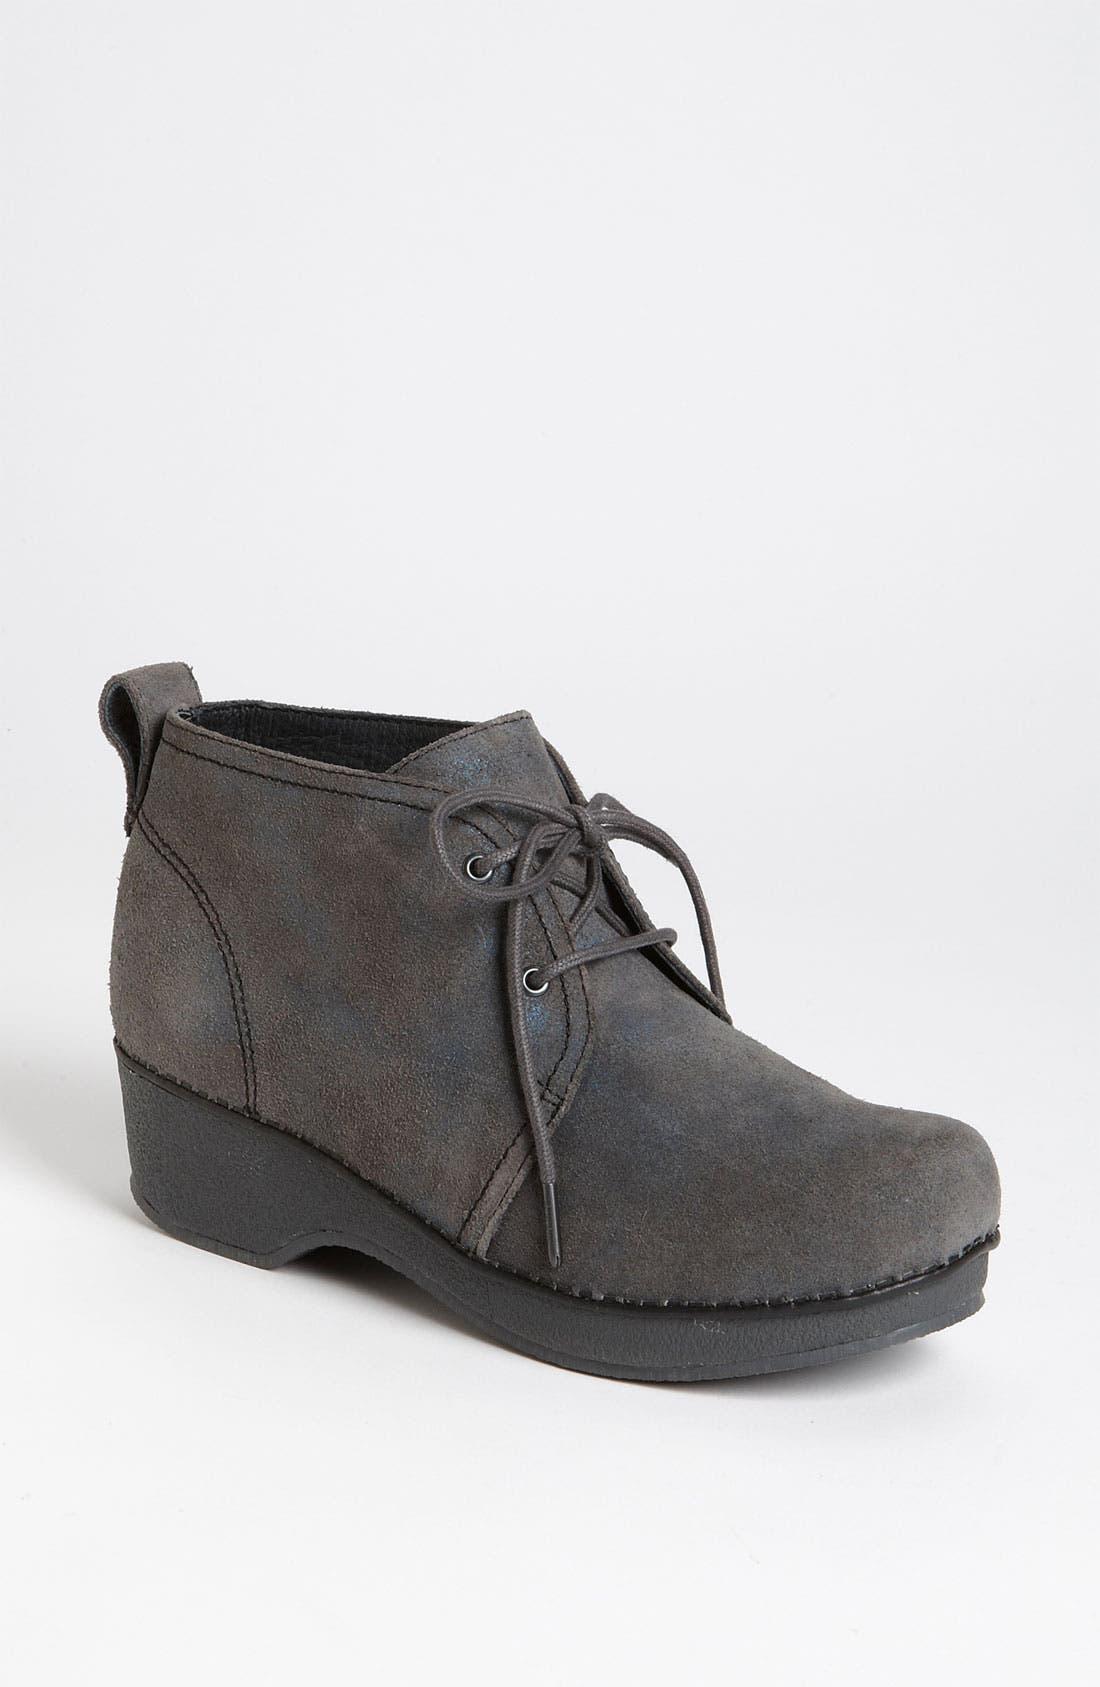 Main Image - Dansko 'Crepe' Chukka Boot